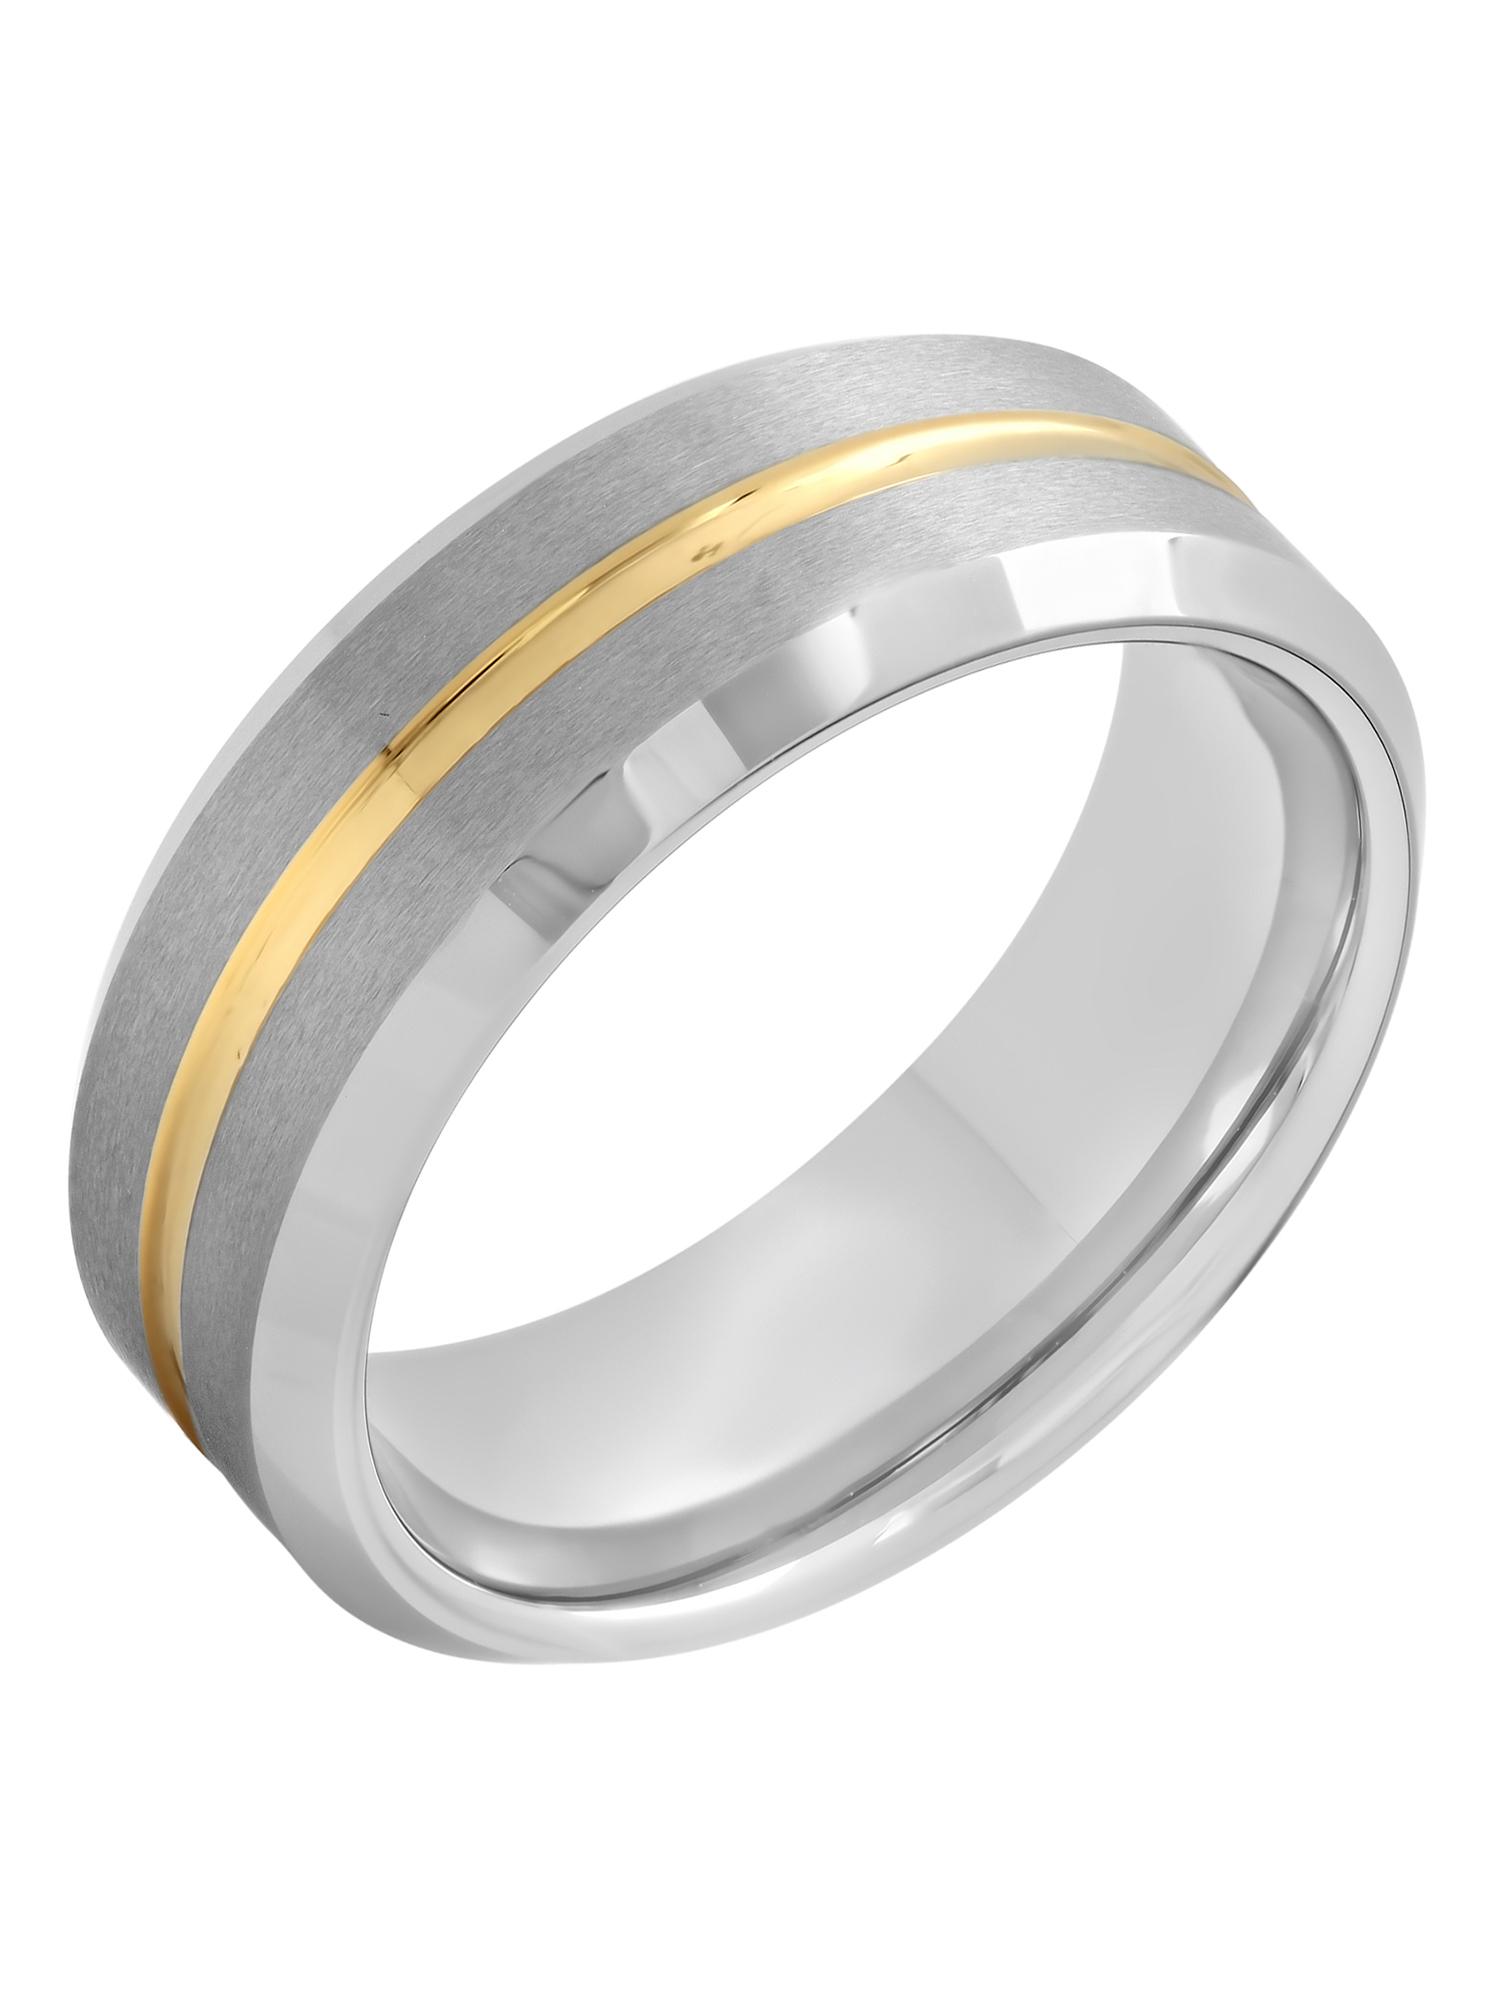 Men's Tungsten 8MM Gold Tone Stripe Wedding Band - Mens Ring